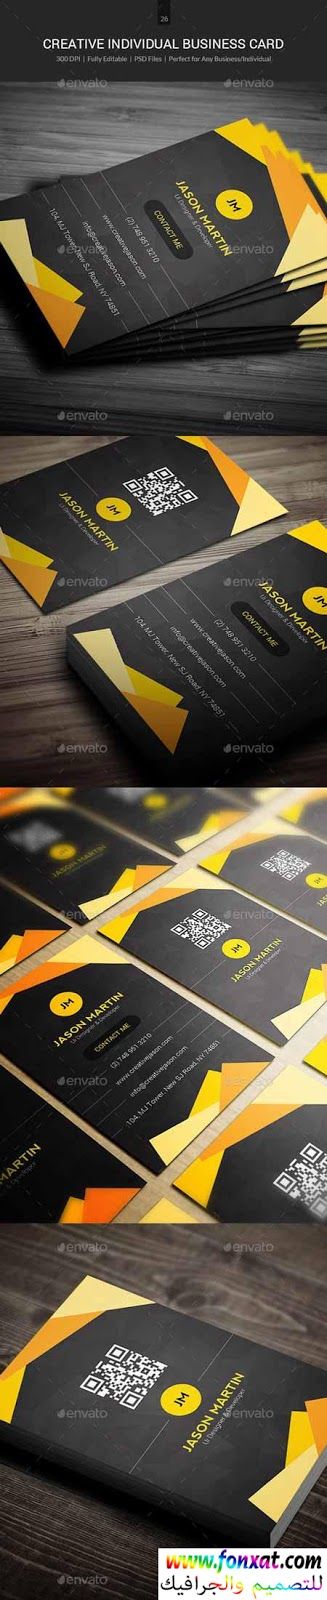 business card تصميم كارت شخصى احترافى psd رقم 19